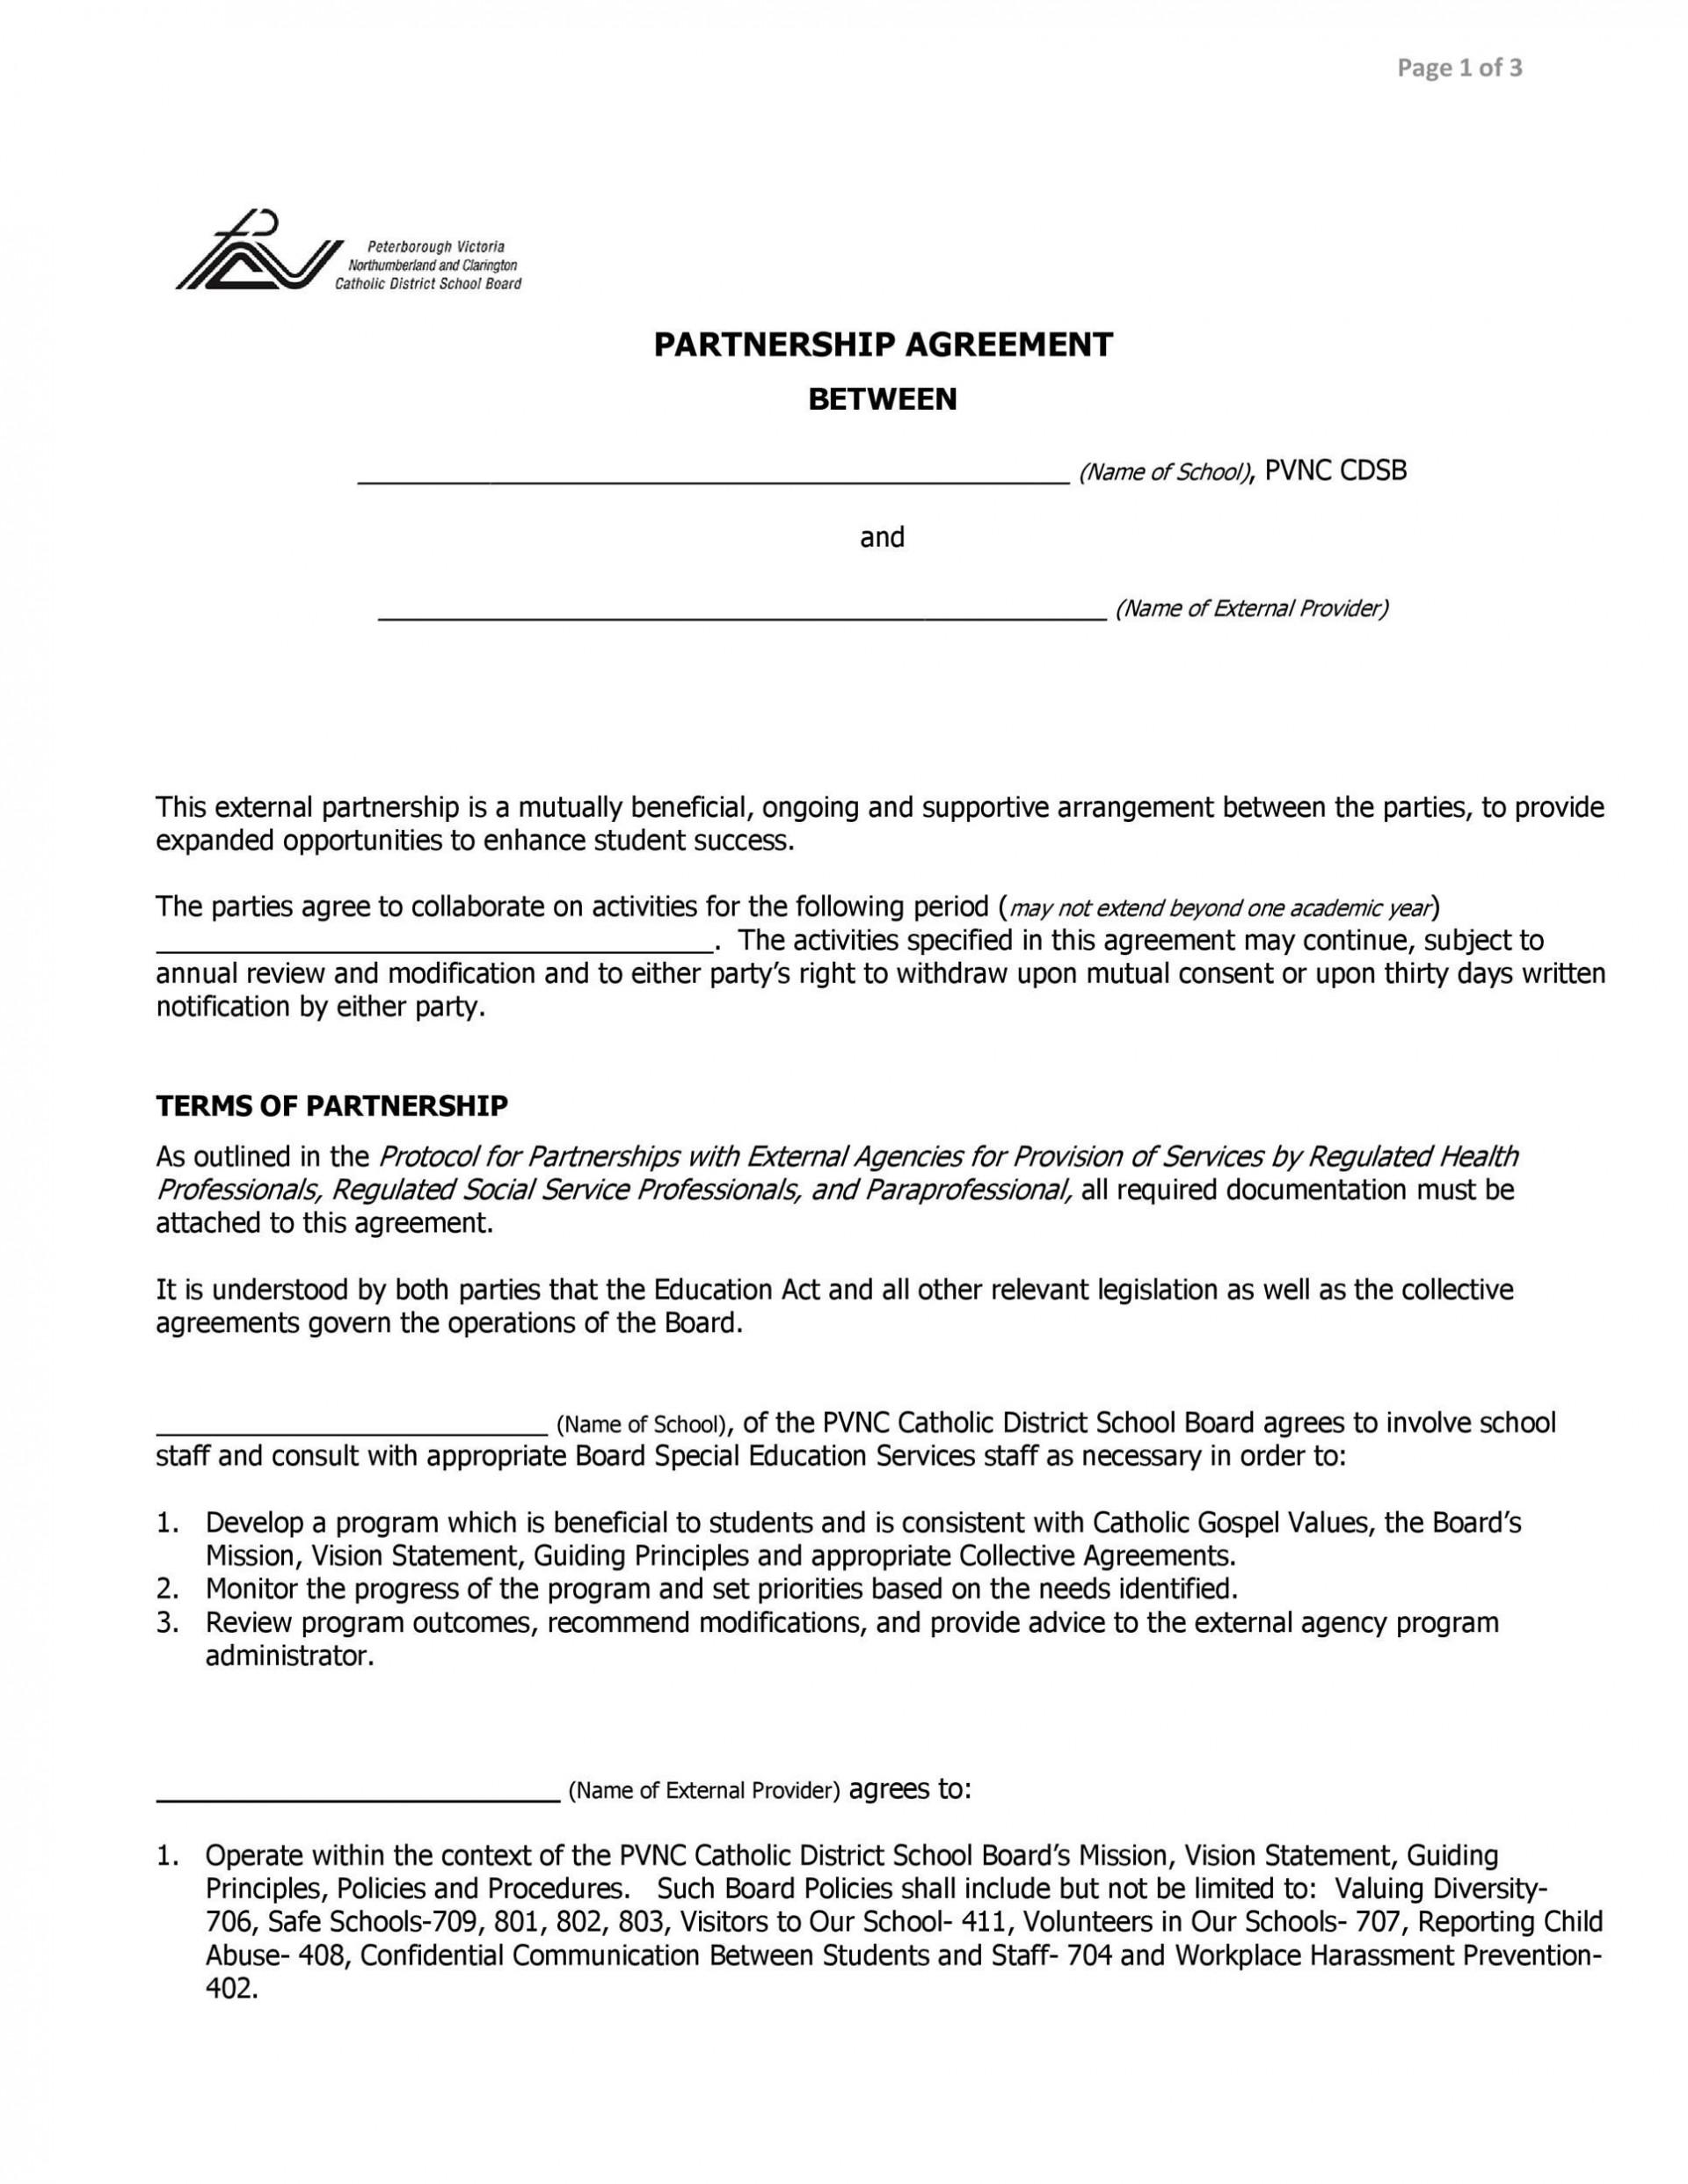 007 Amazing Limited Company Partnership Agreement Template Uk Inspiration 1920